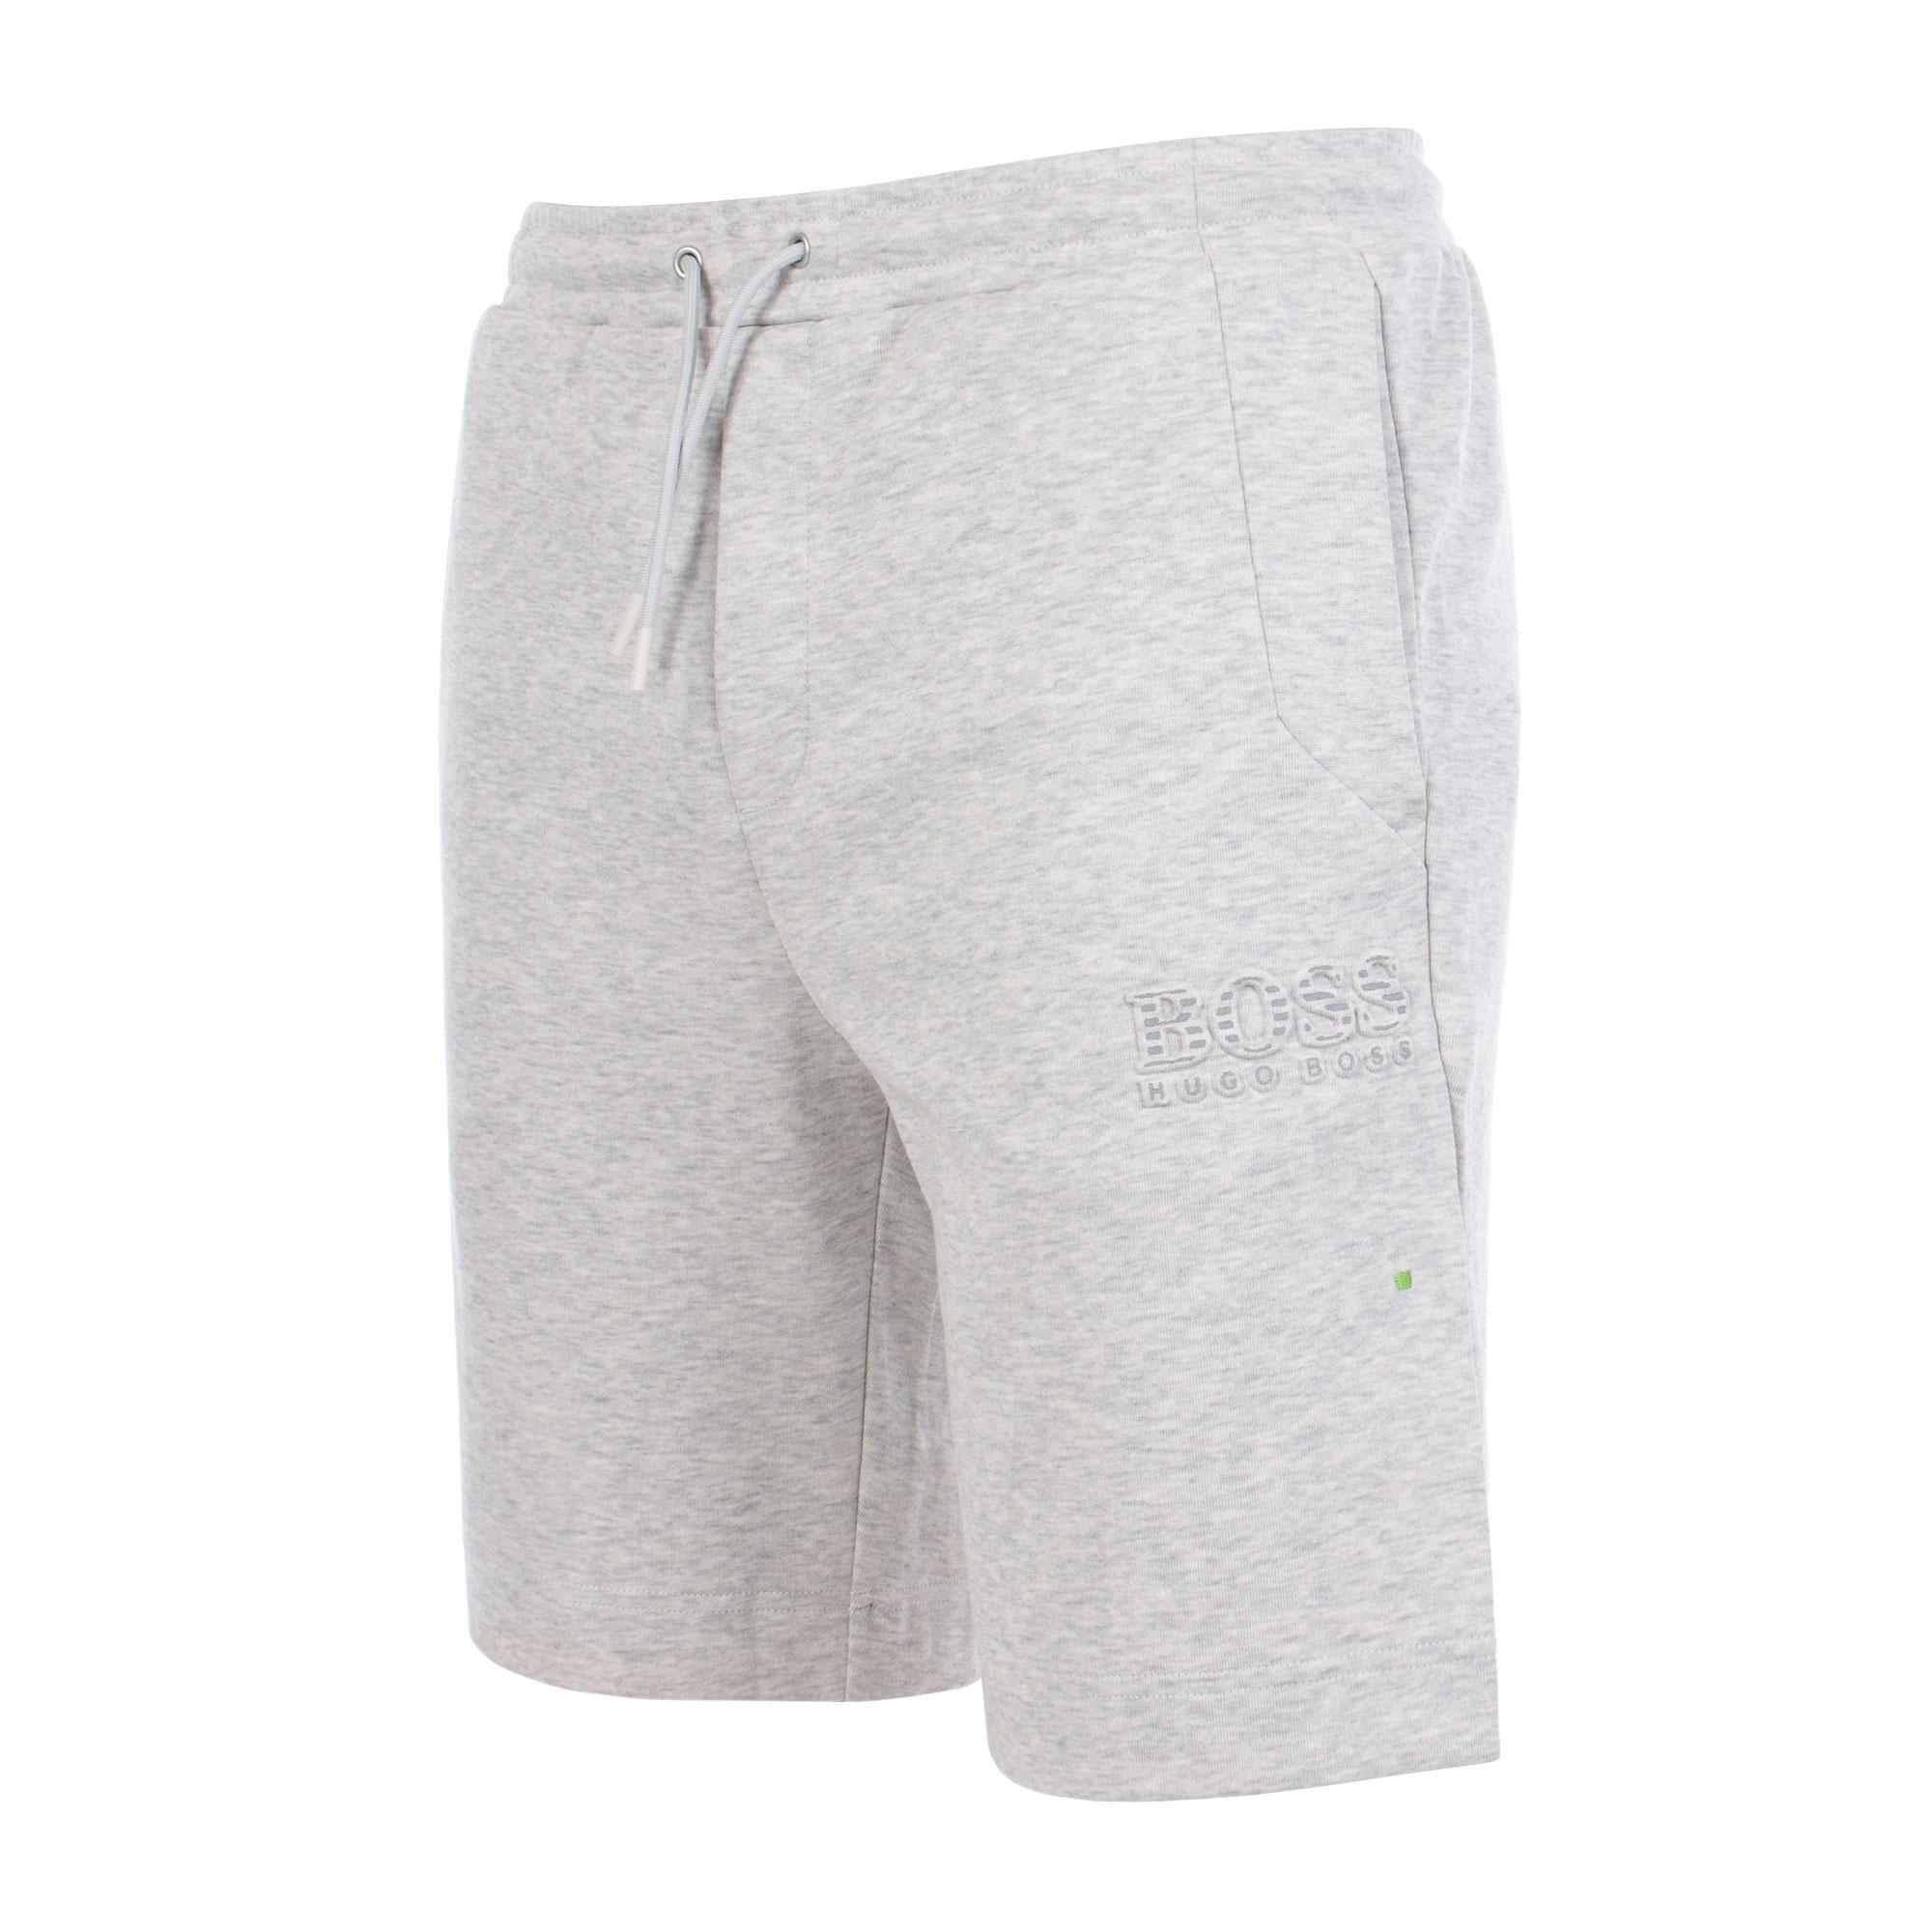 da5b952f5 BOSS Athleisure Headlo Shorts in Gray for Men - Lyst